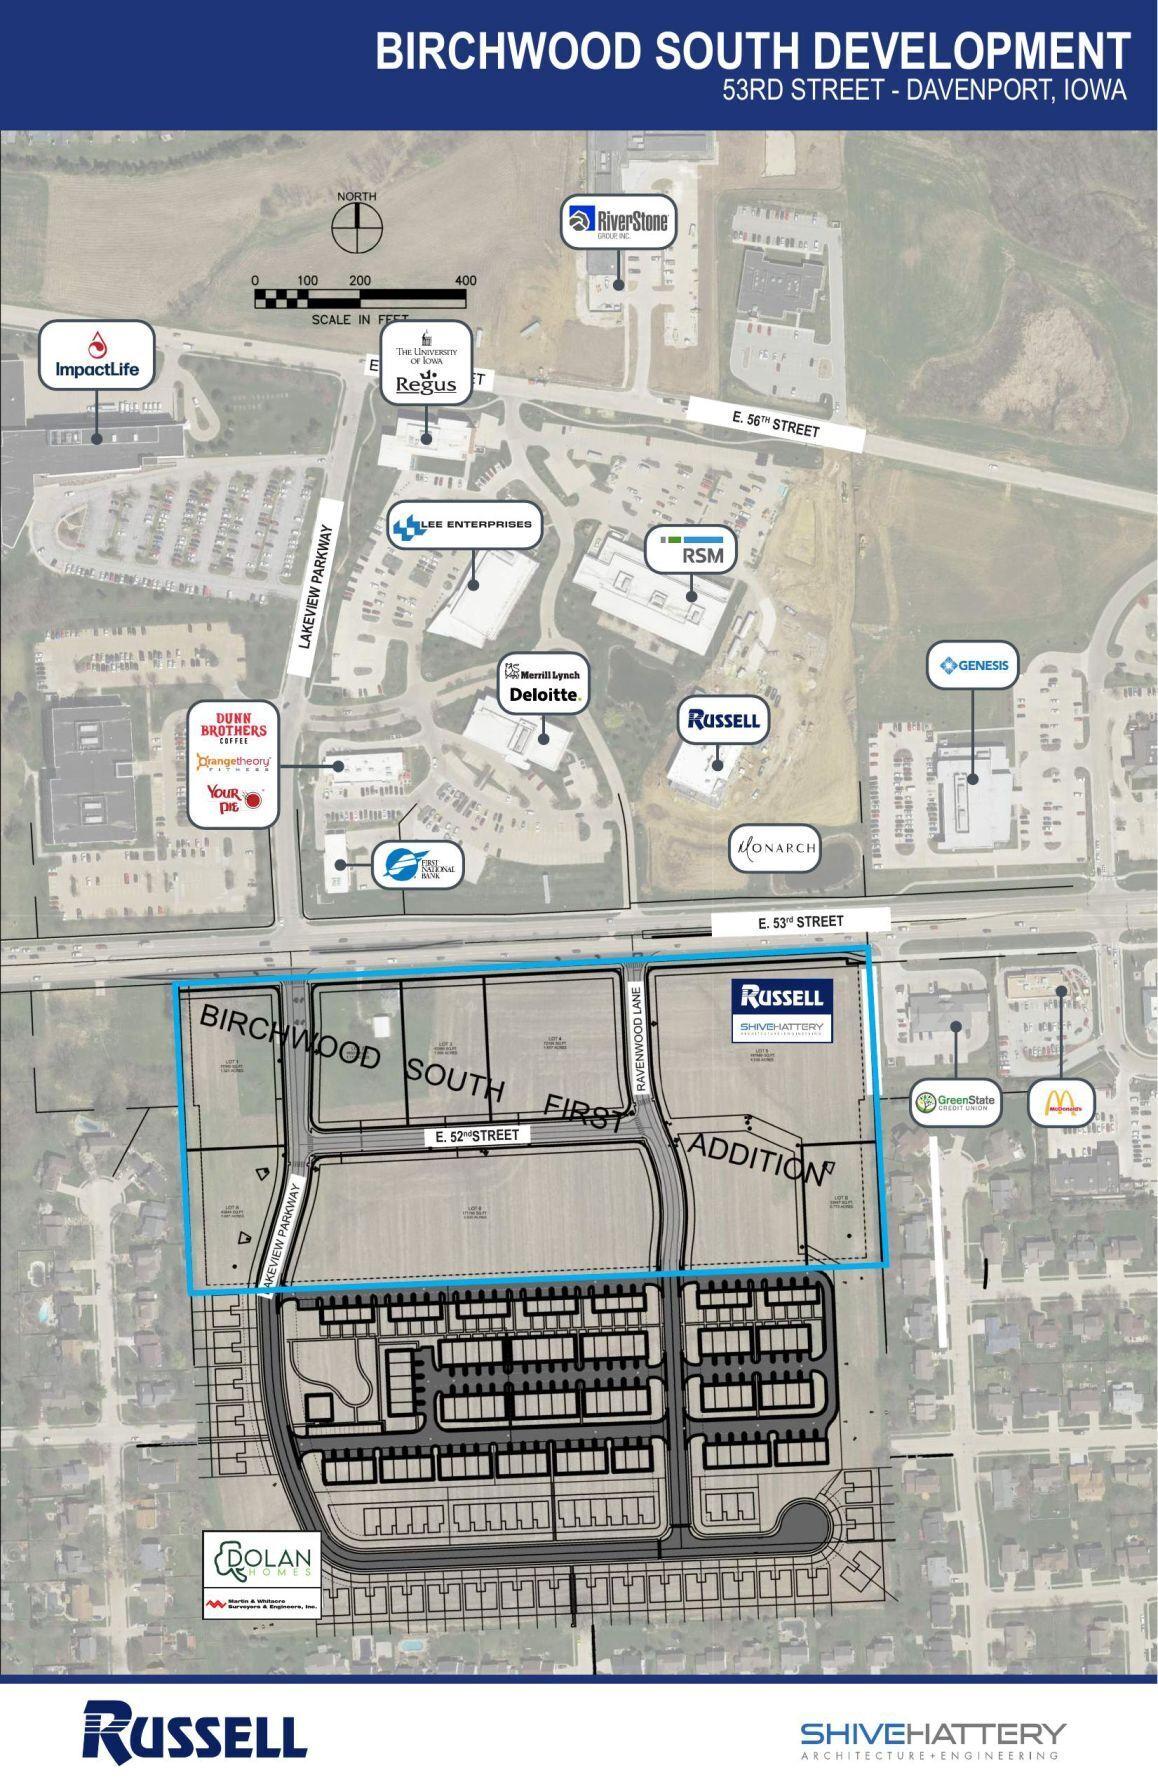 Birchwood South Development - map